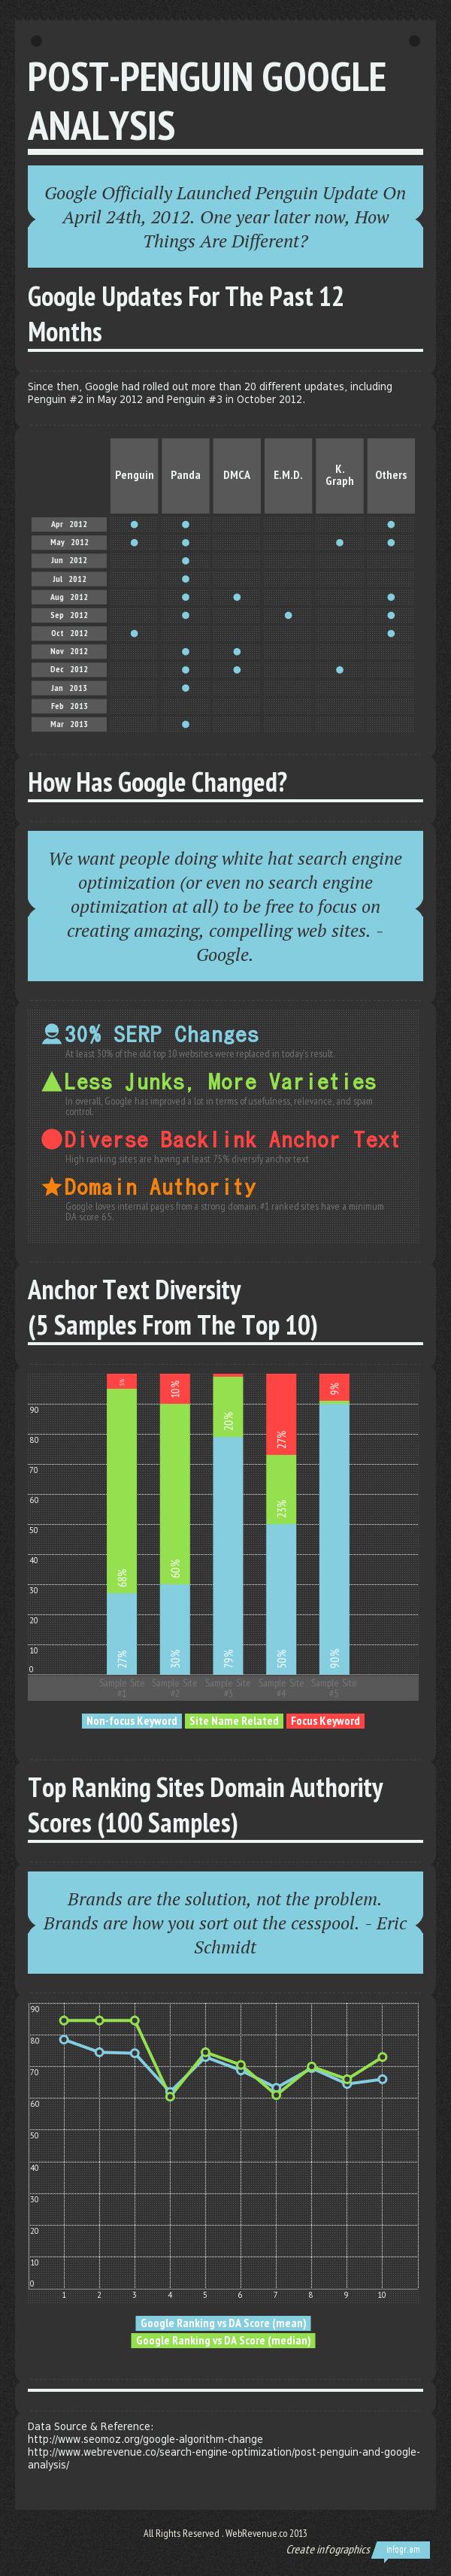 Google SEO Analysis Infographic